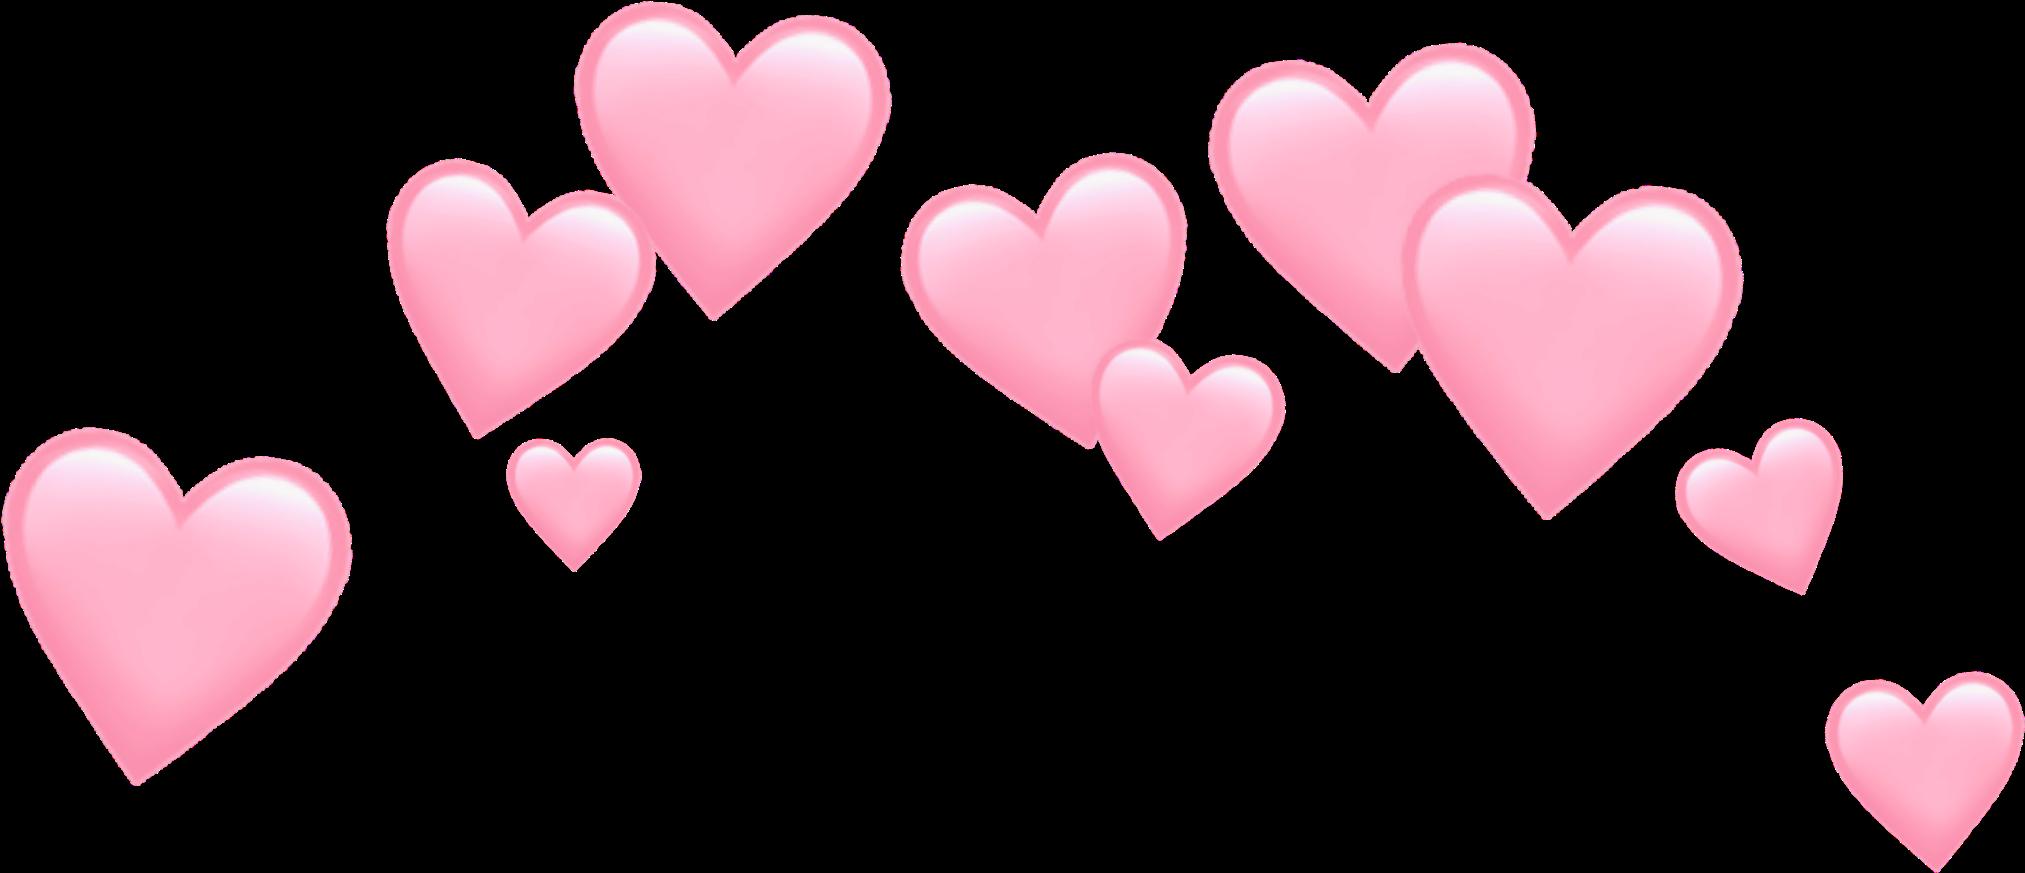 Para Fotos 3 Emoji Clipart Pink Heart Heart Emoji